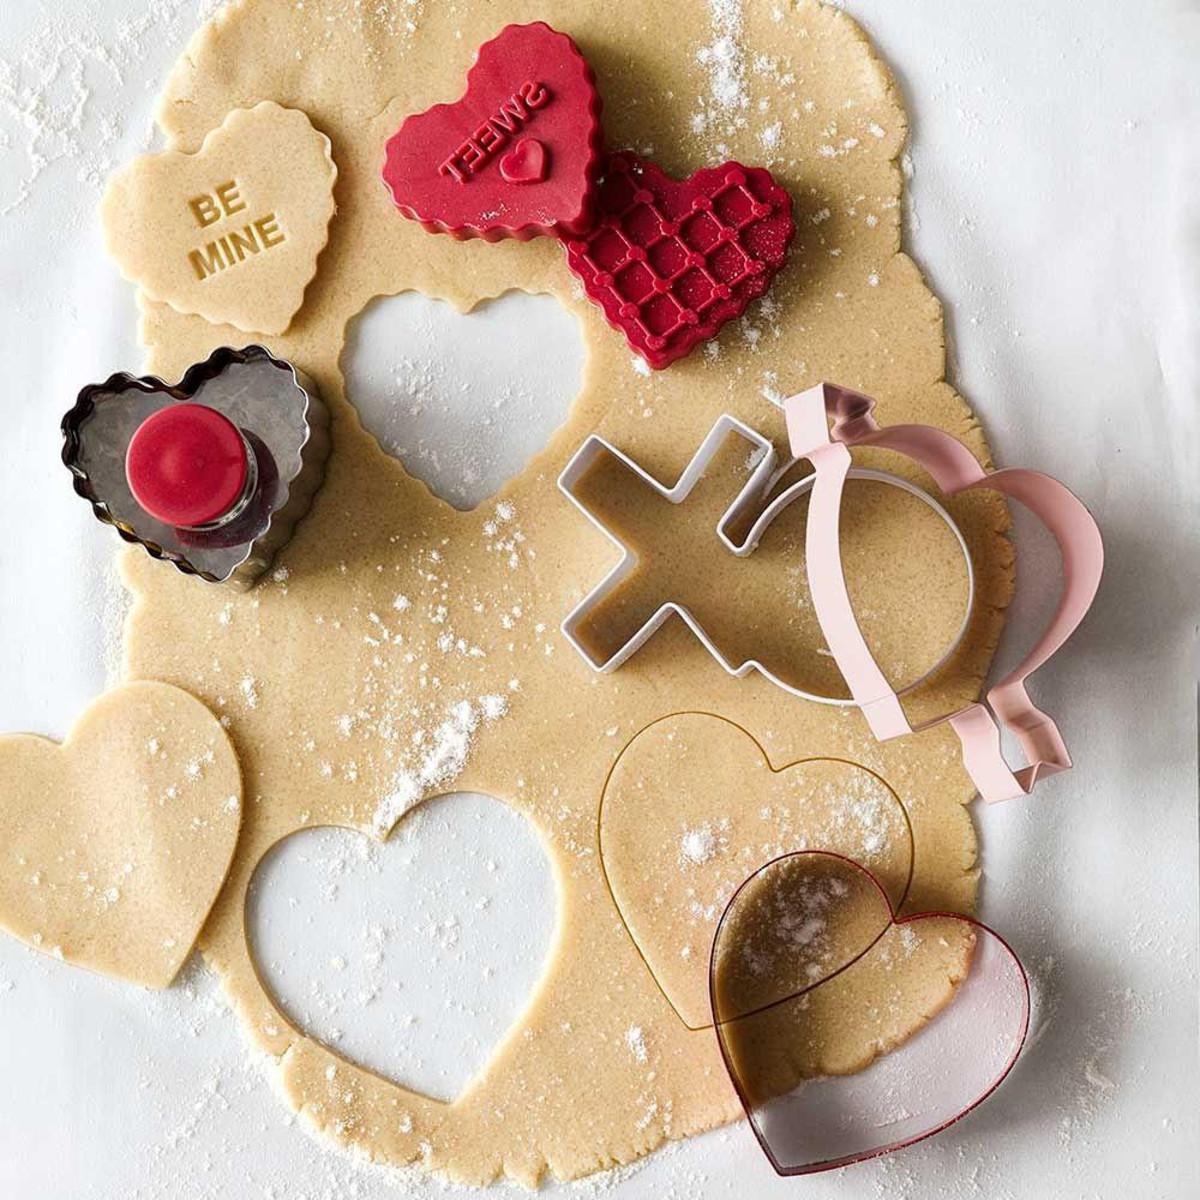 Valentine Heart Stamp Cookie Cutter Set by Williams-Sonoma ,$18.